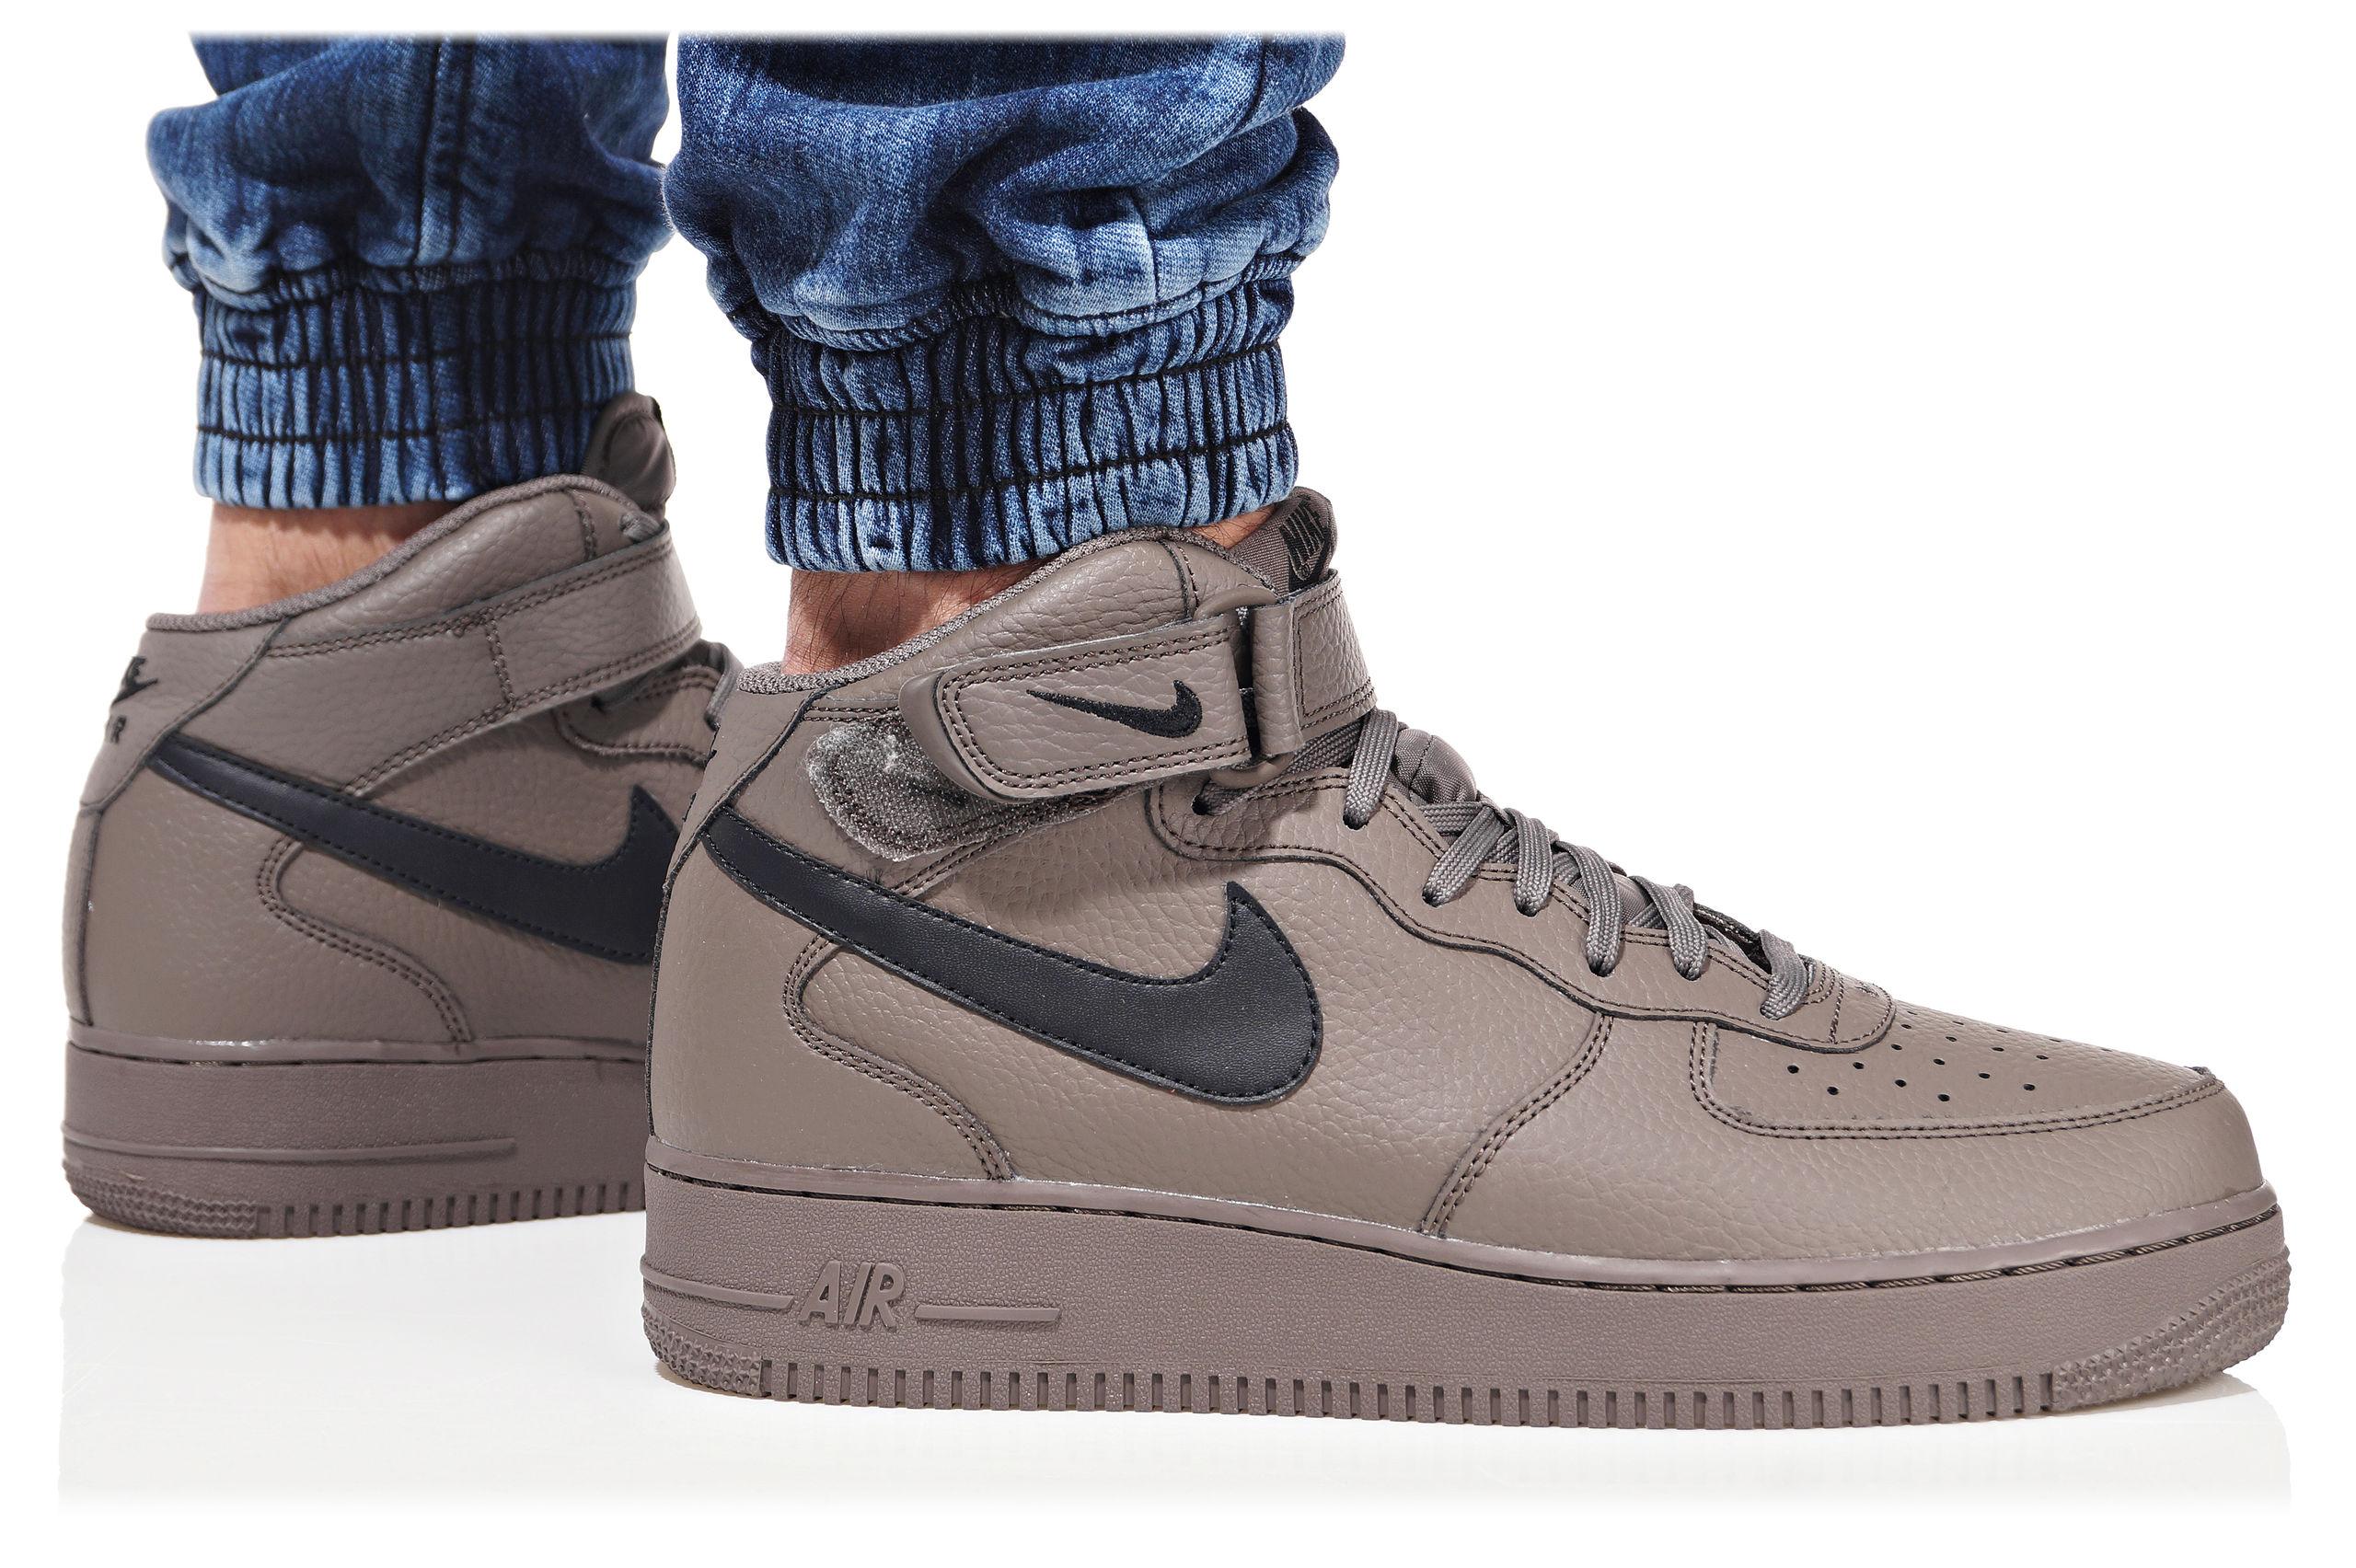 sports shoes 48a3c b8f8c BUTY NIKE AIR FORCE 1 MID 07 MĘSKIE 315123-205